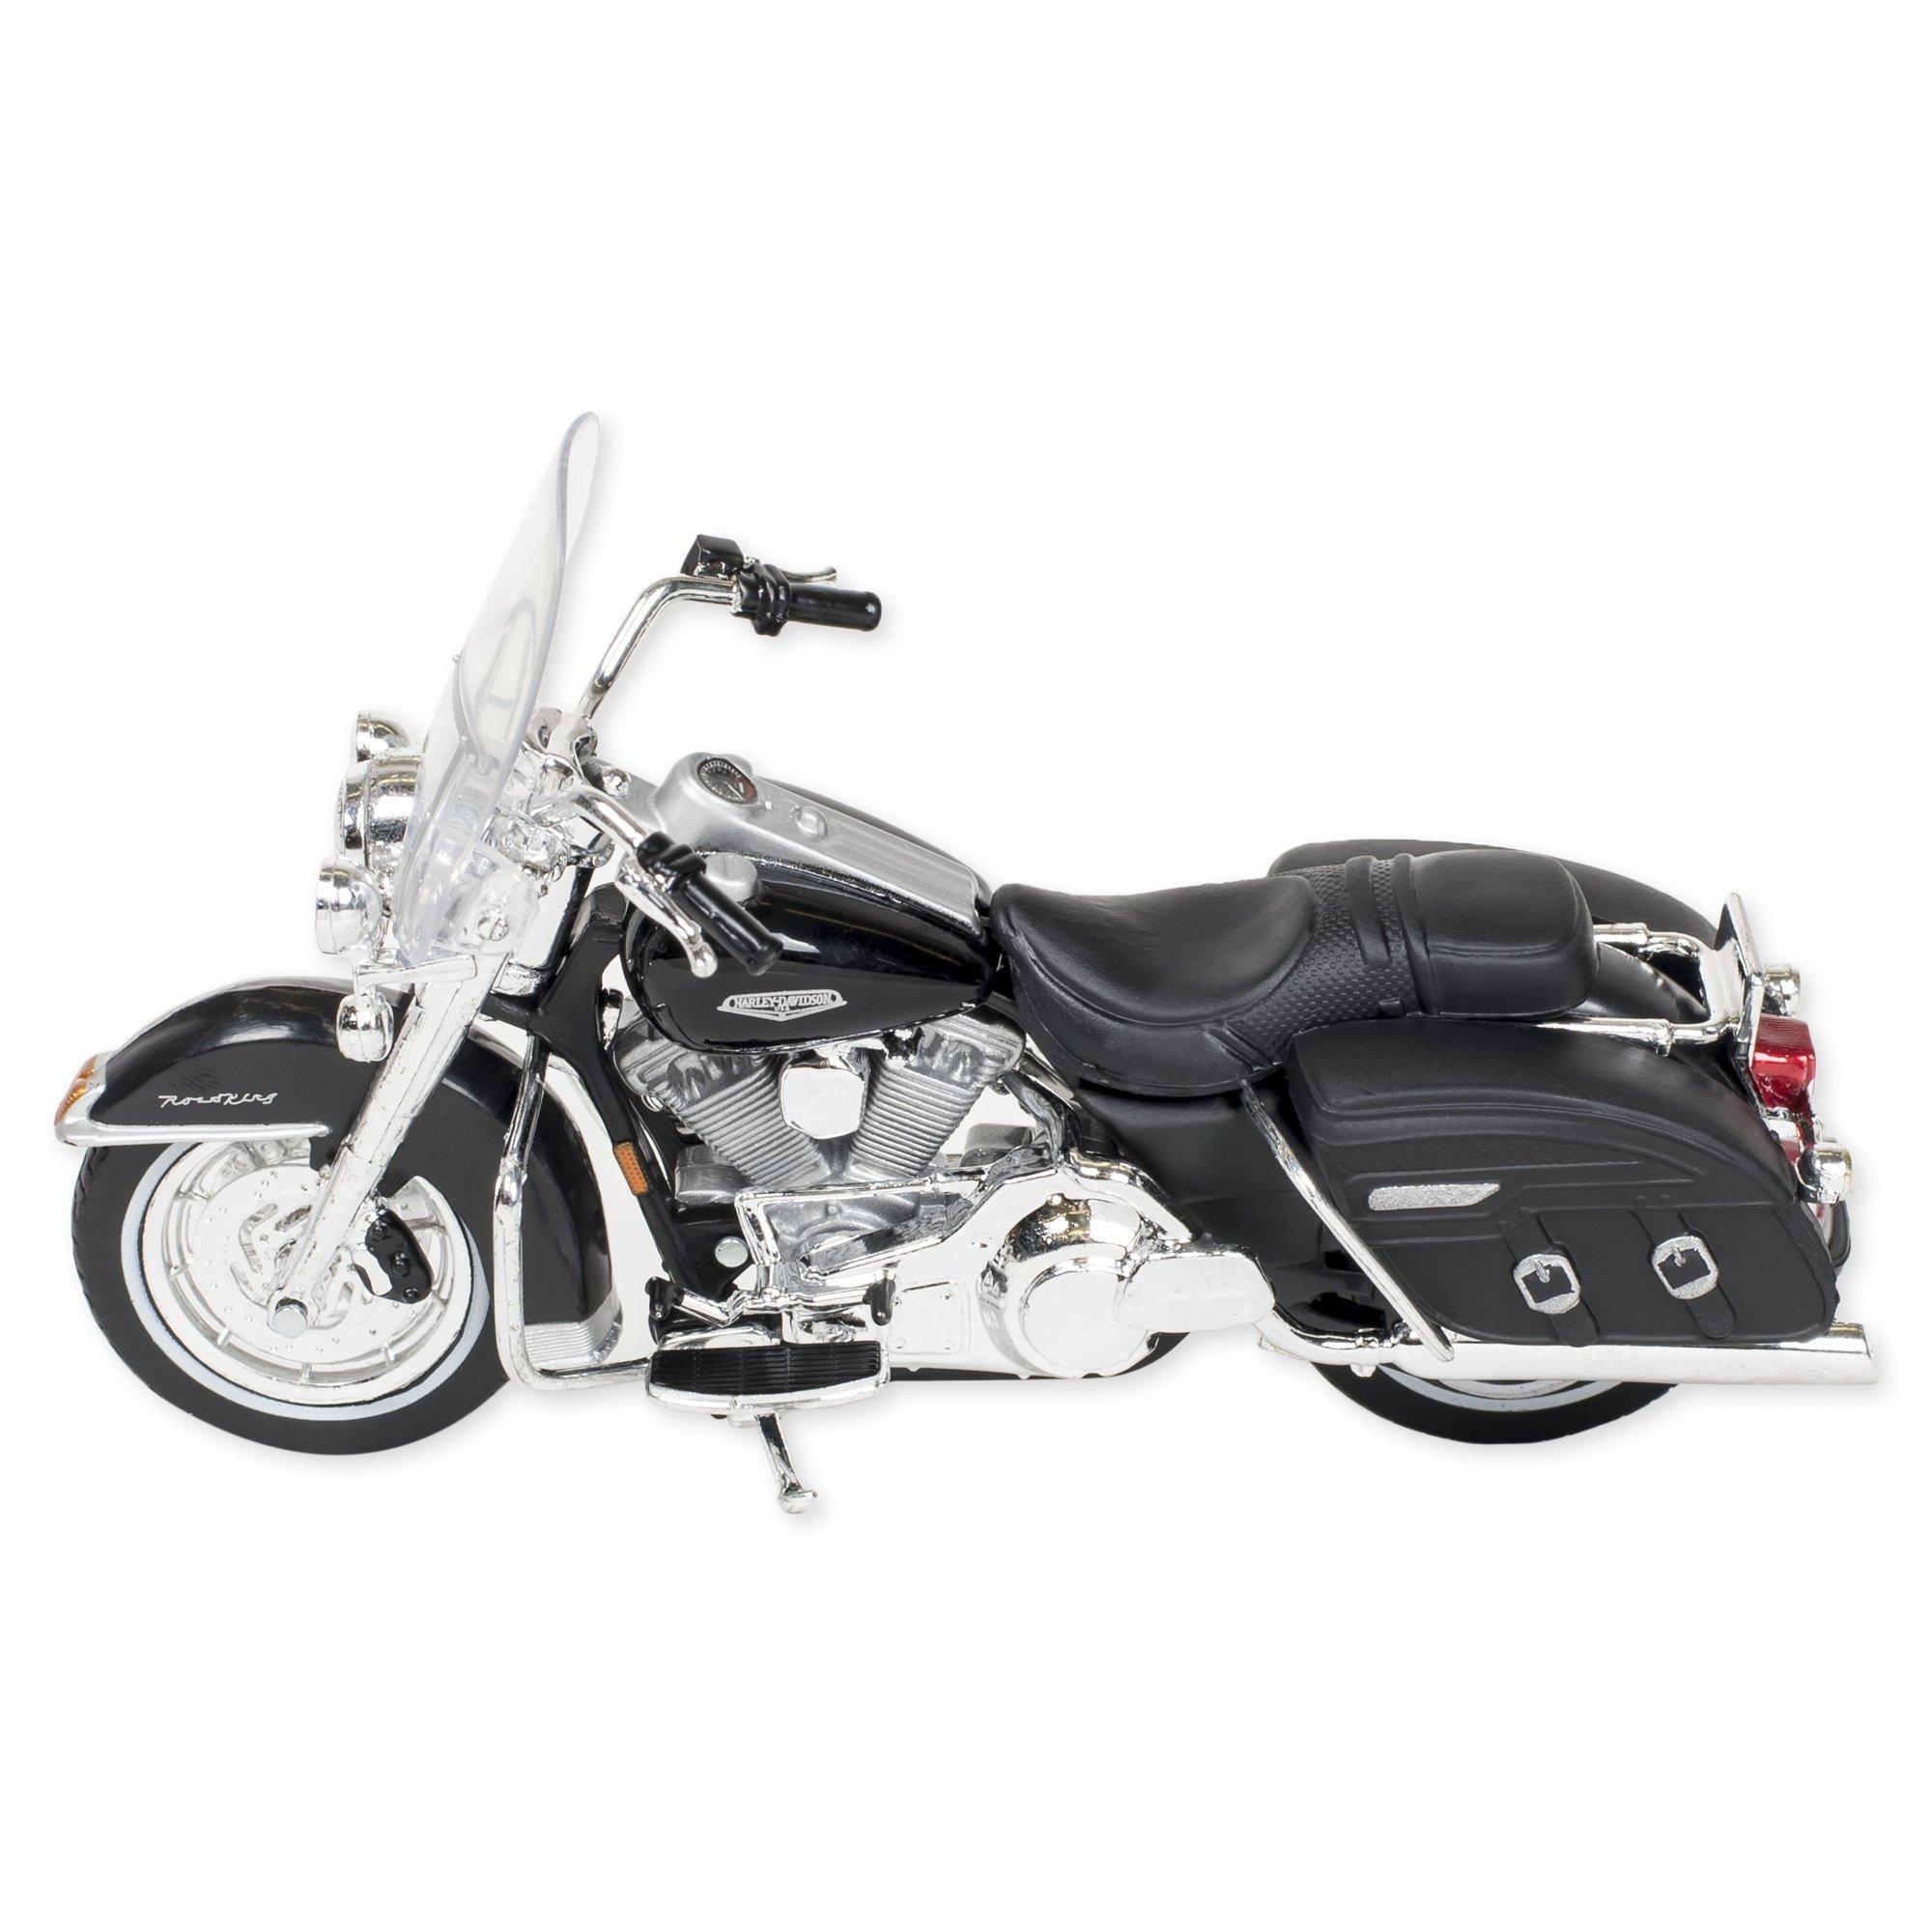 Harley-Davidson Motorcycle Die-Cast Toy Series 33-2001 FLHRC Road King Classic